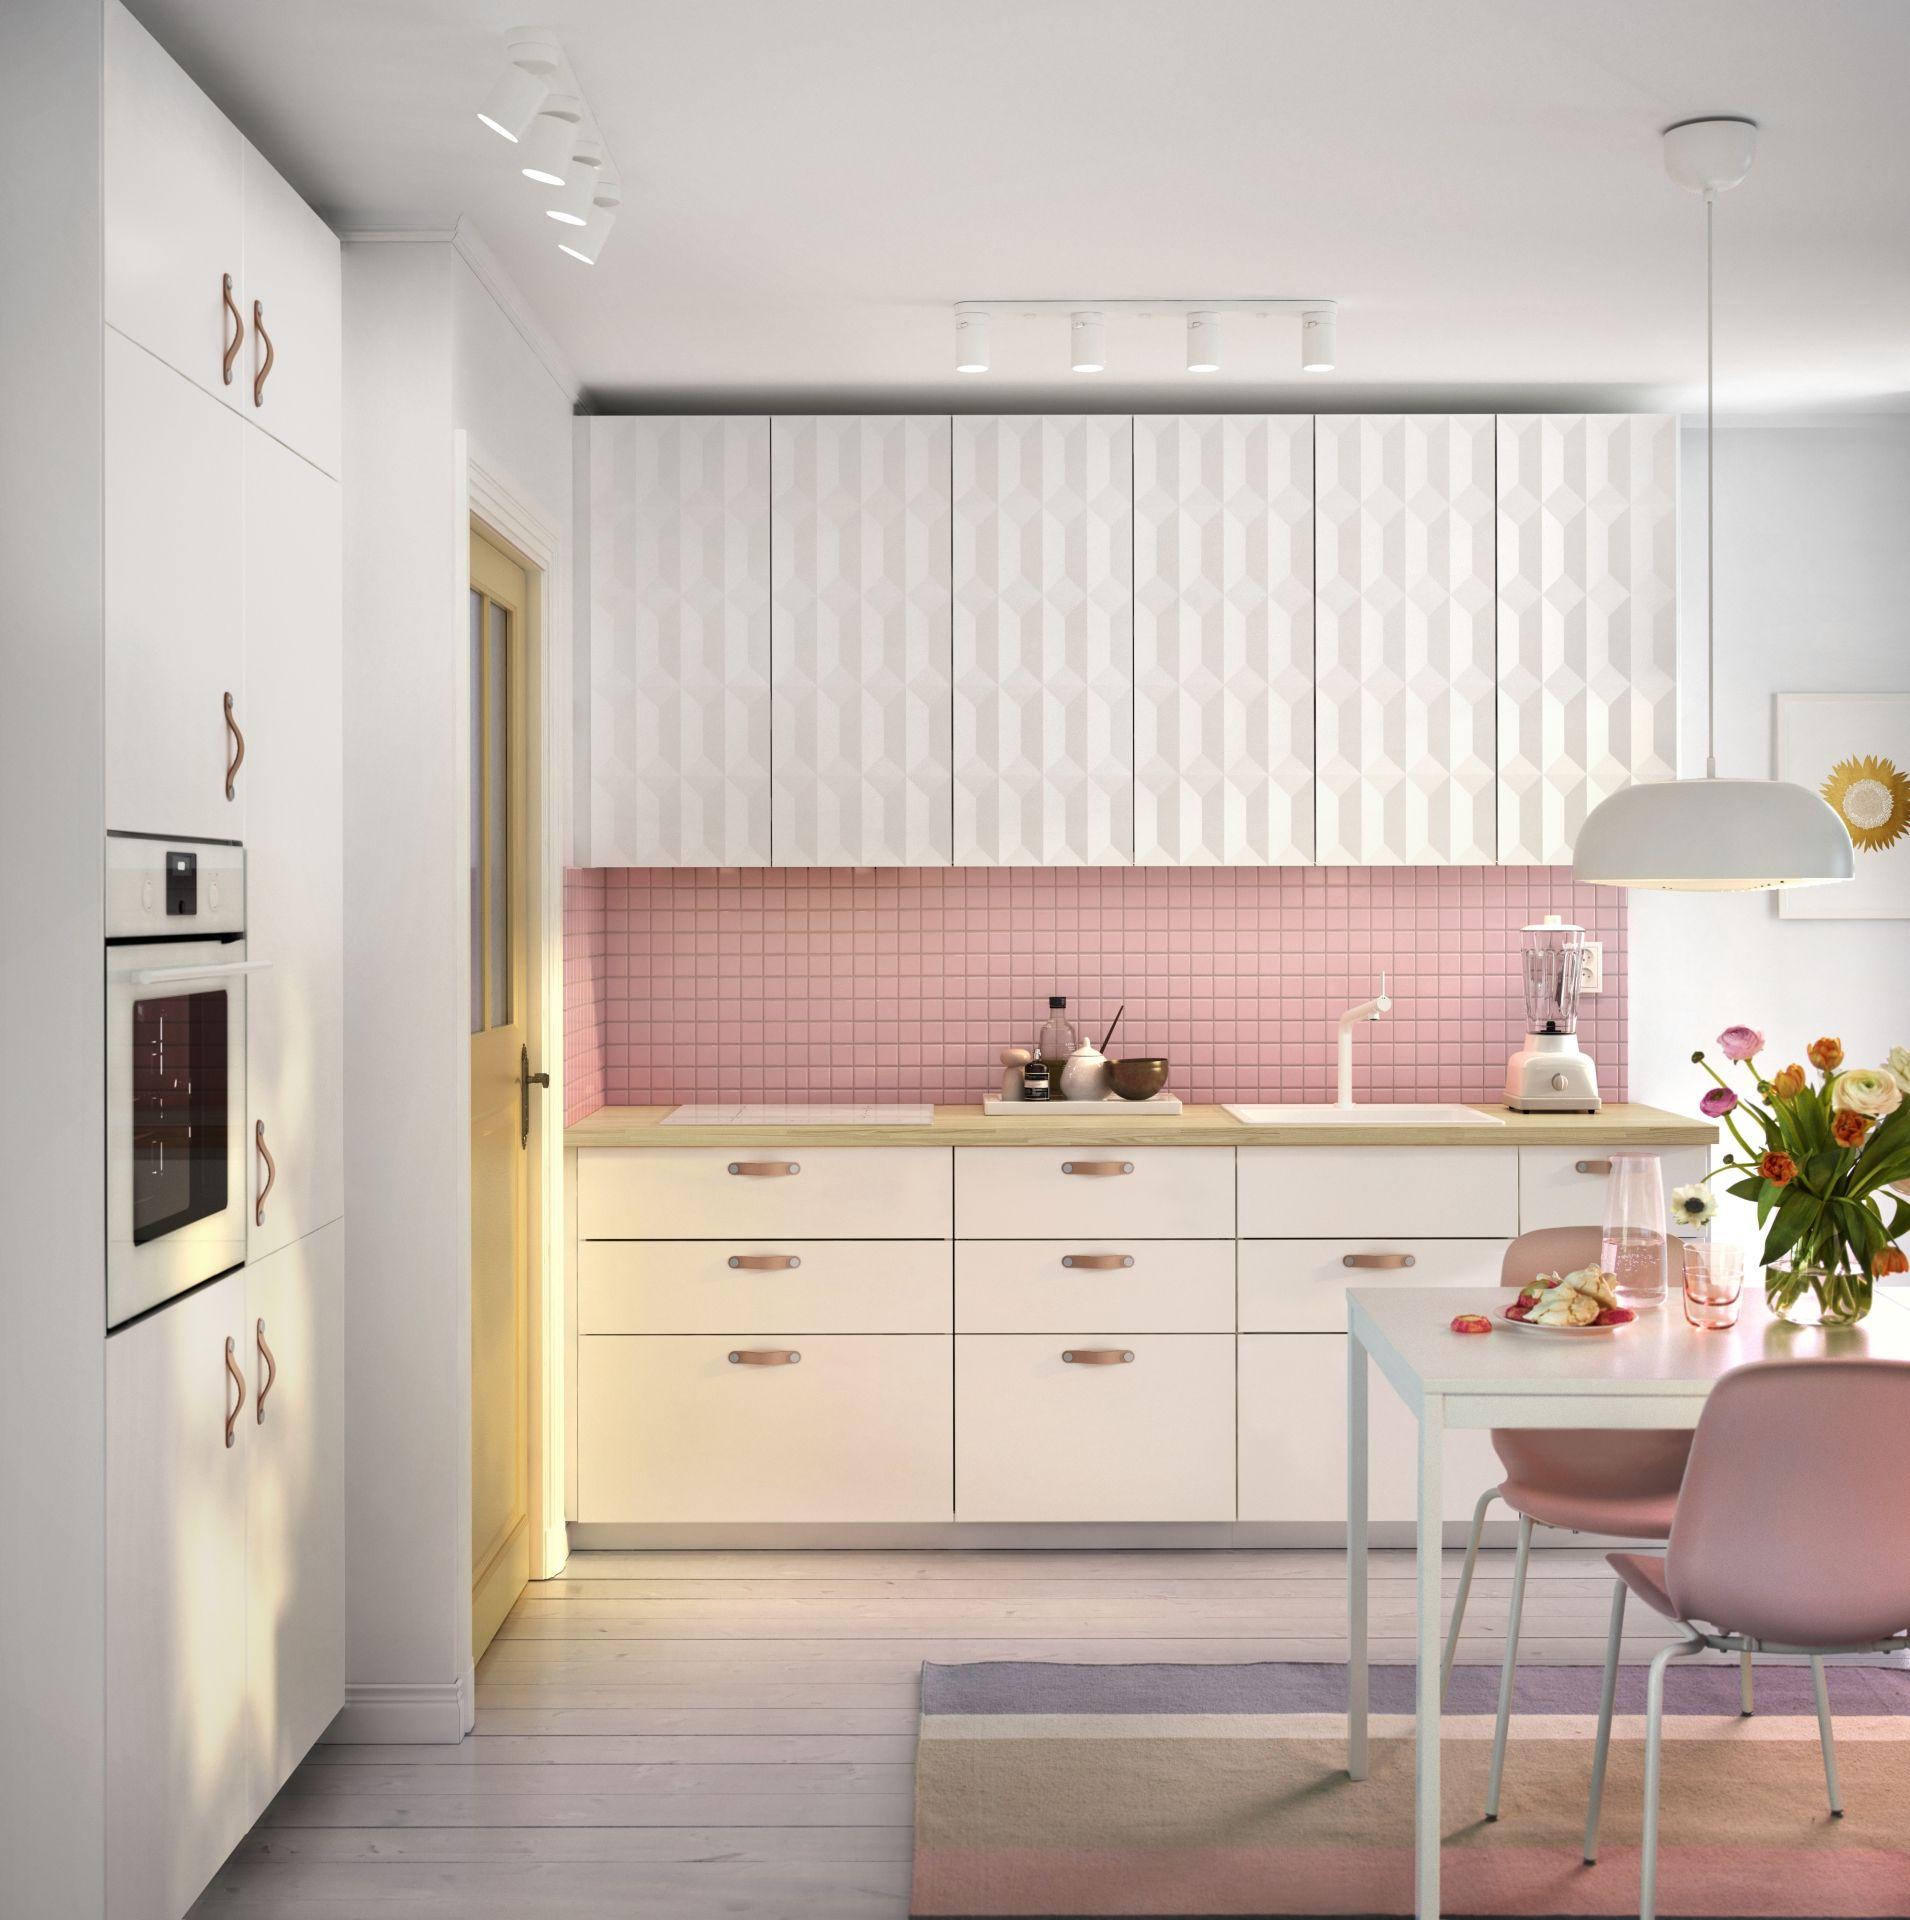 metod voxtorp keuken ikea ikeanl ikeanederland fronten. Black Bedroom Furniture Sets. Home Design Ideas